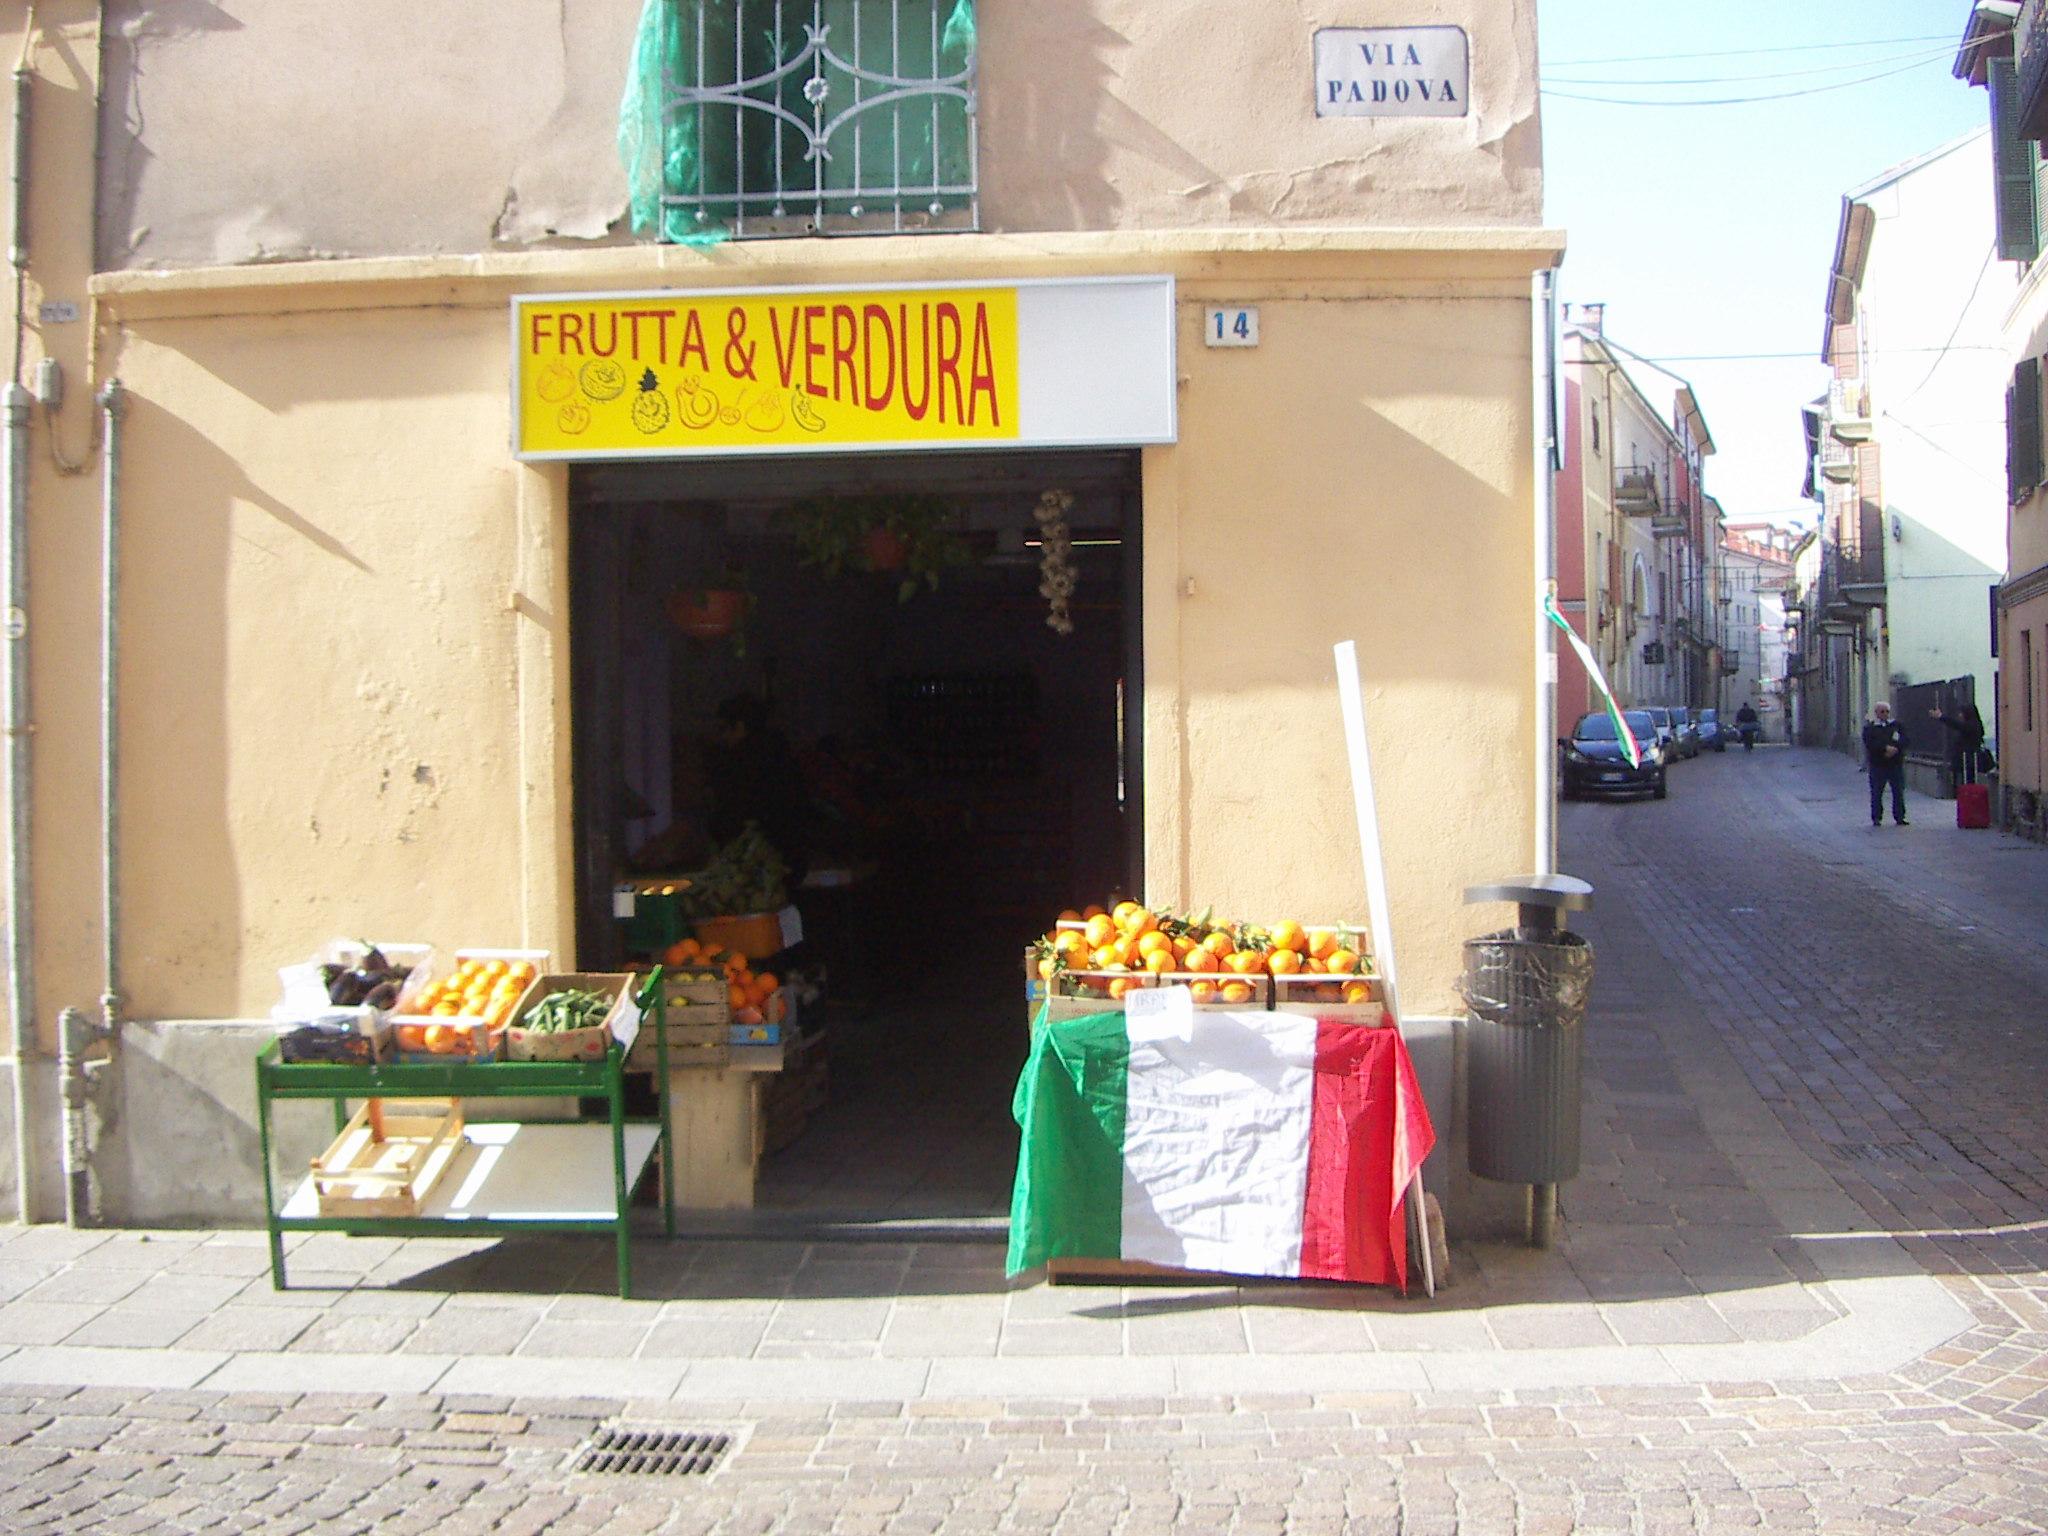 frutta verdura, via padova, tricolore